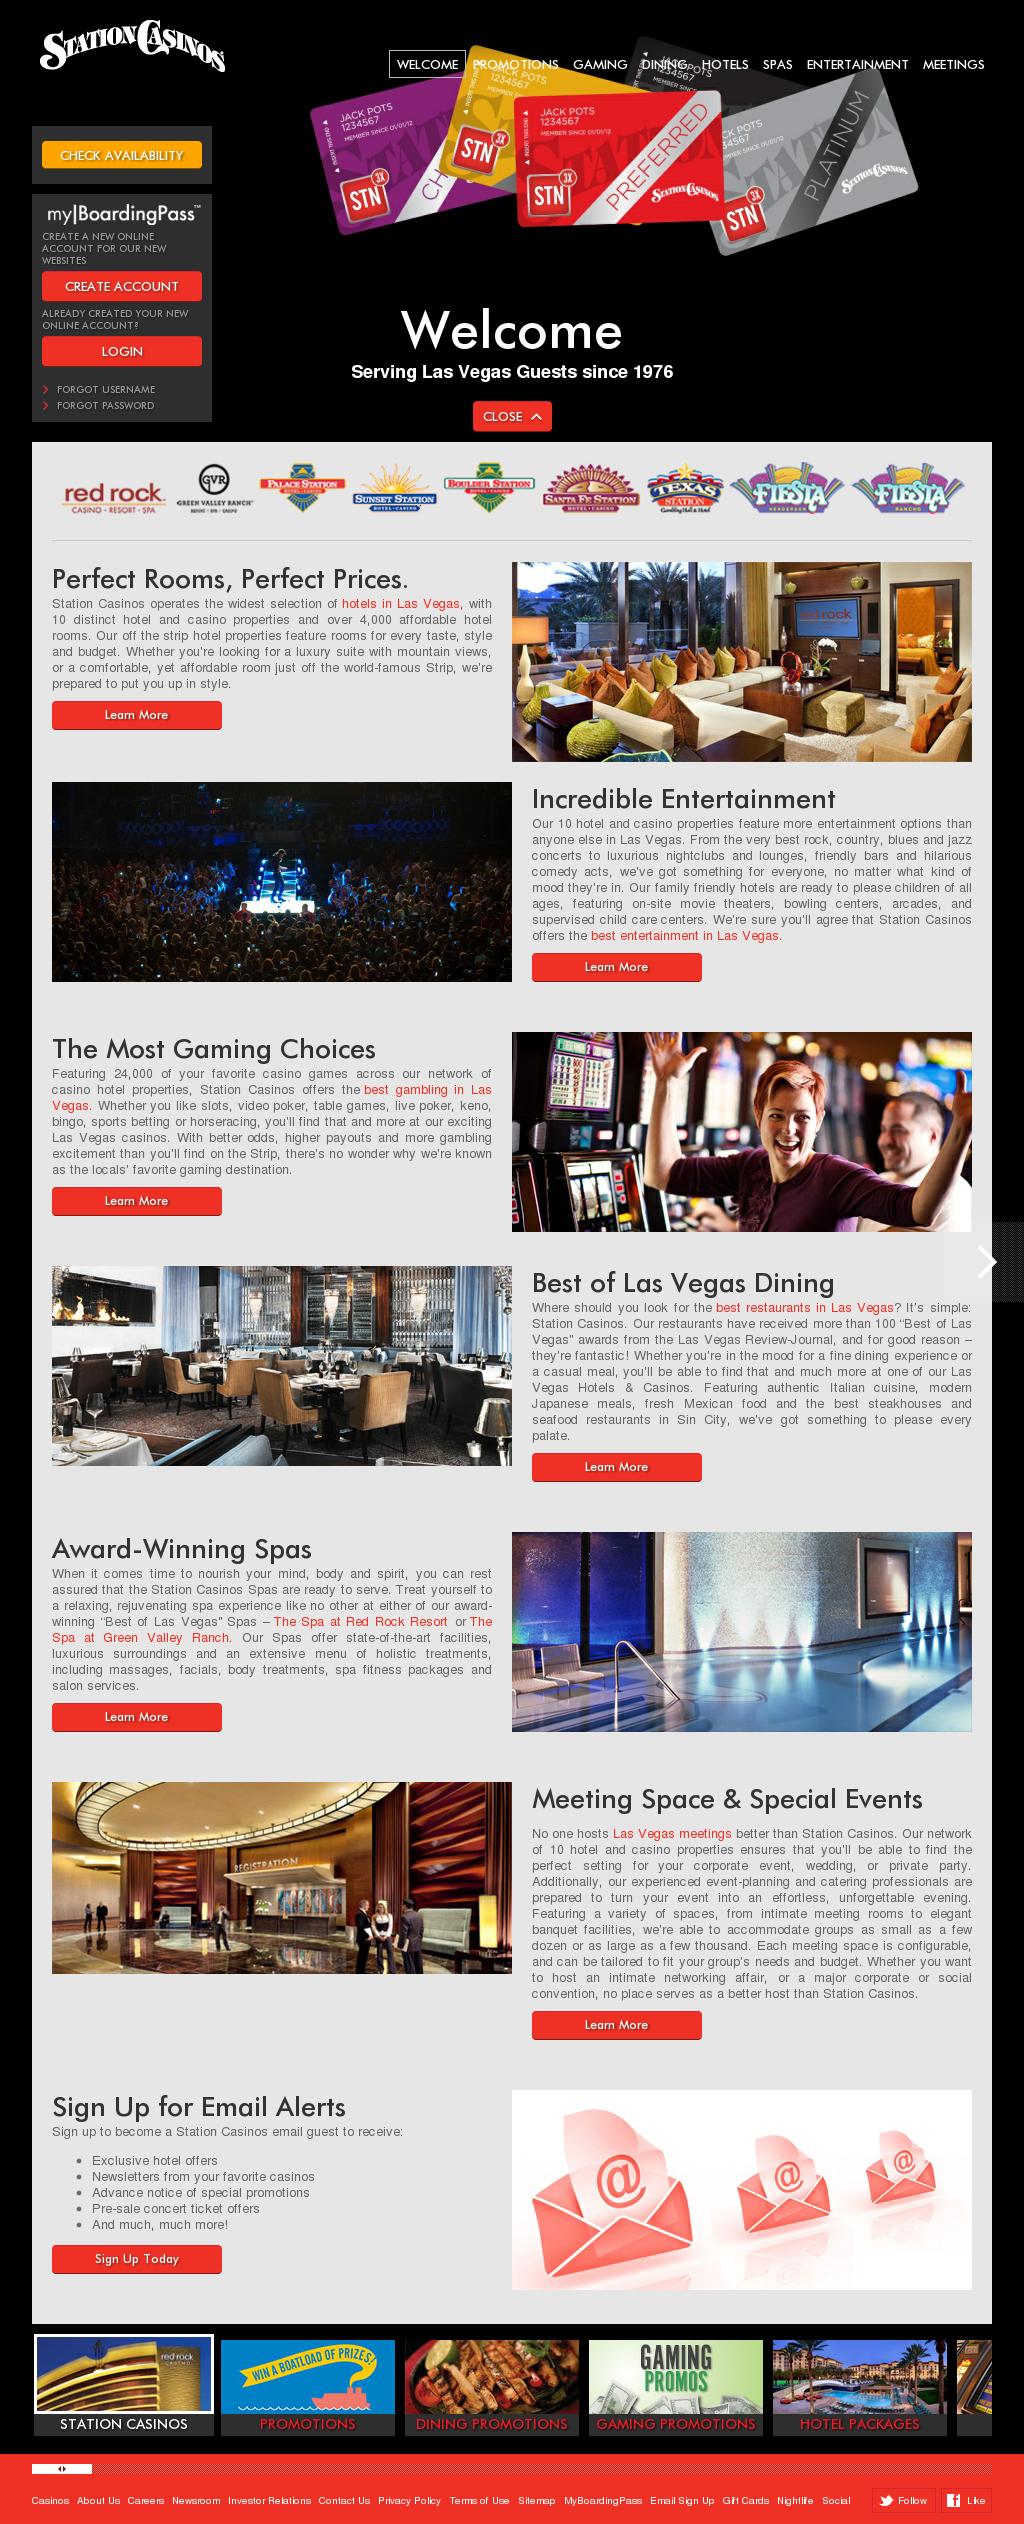 Station casinos boarding pass redemption menu download game casino nokia c3